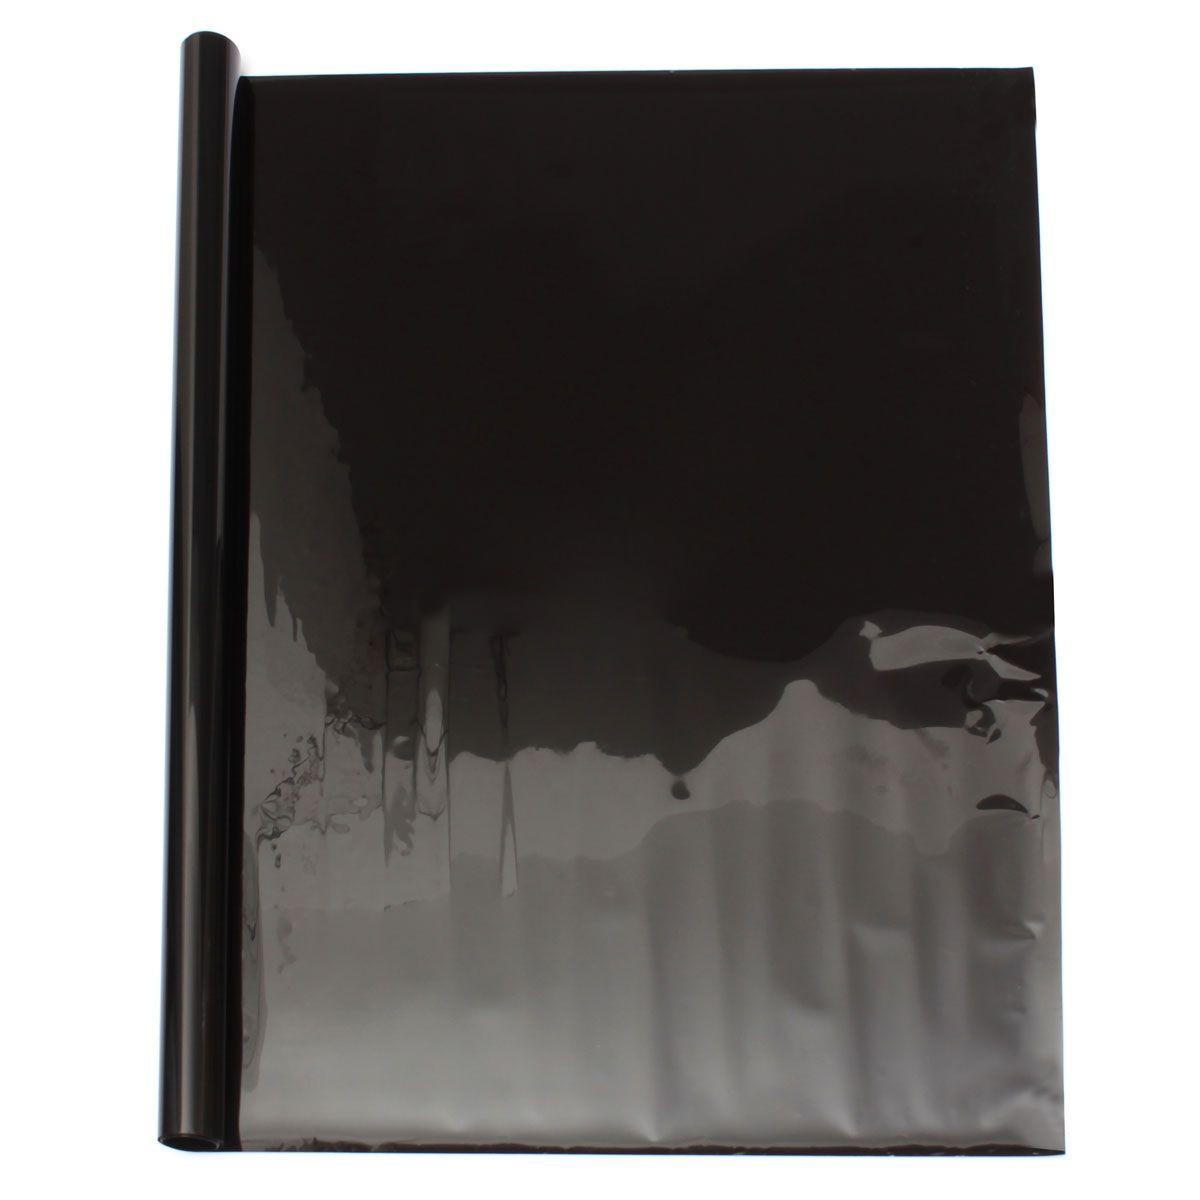 Car Auto Home Window Glass Tint Film Tinting VLT ULTRA LIMO Black 3mx50cm -5%